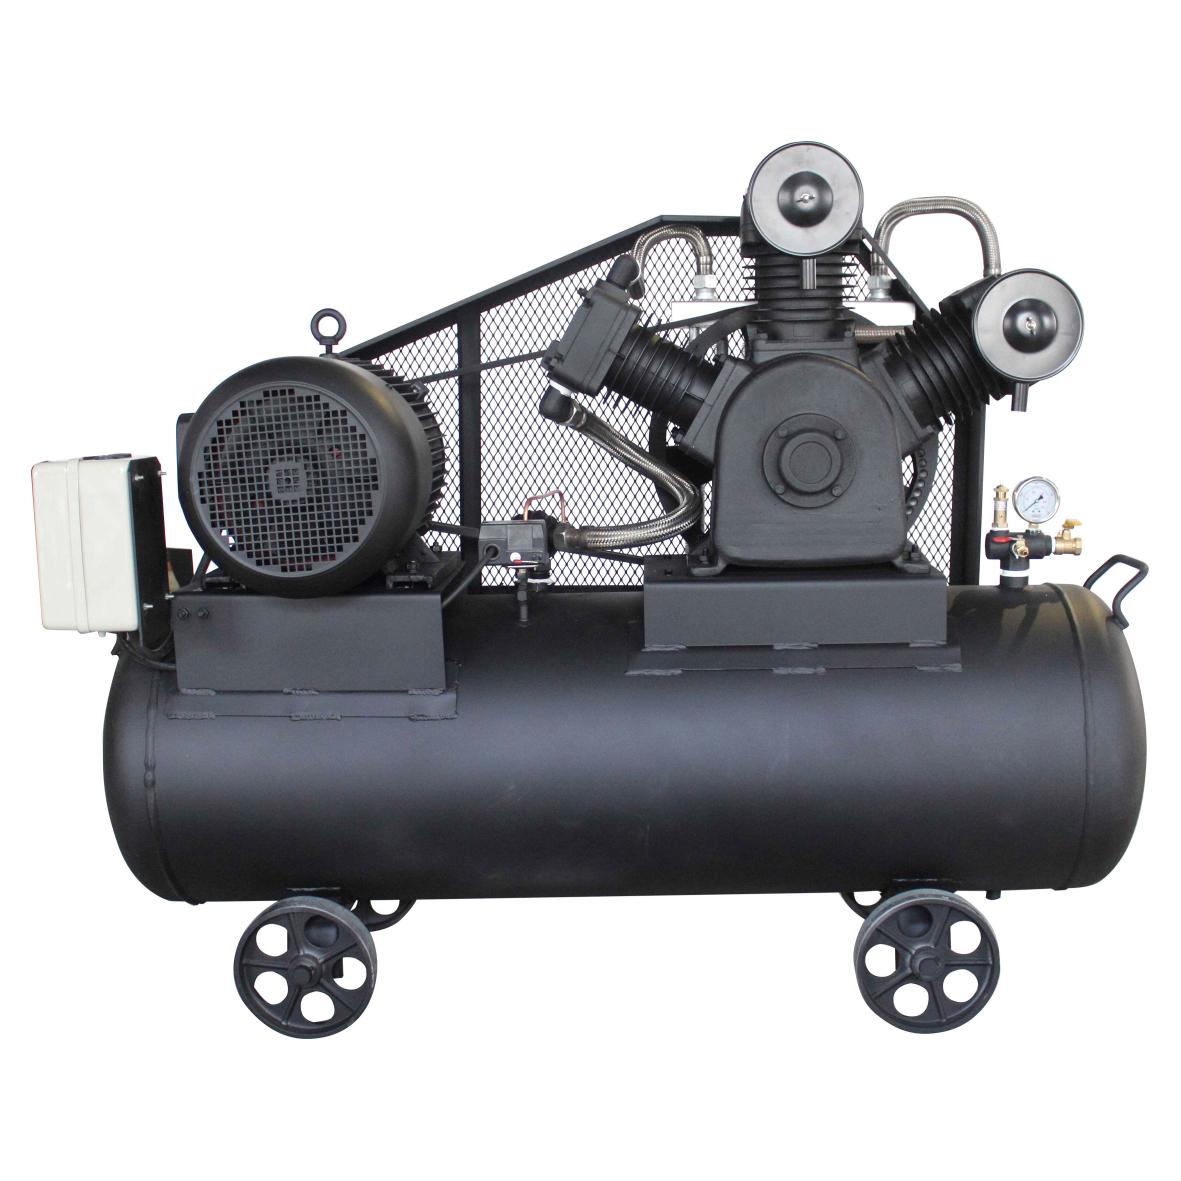 WW-1.2/10 Air Compressor Machine Featured Image